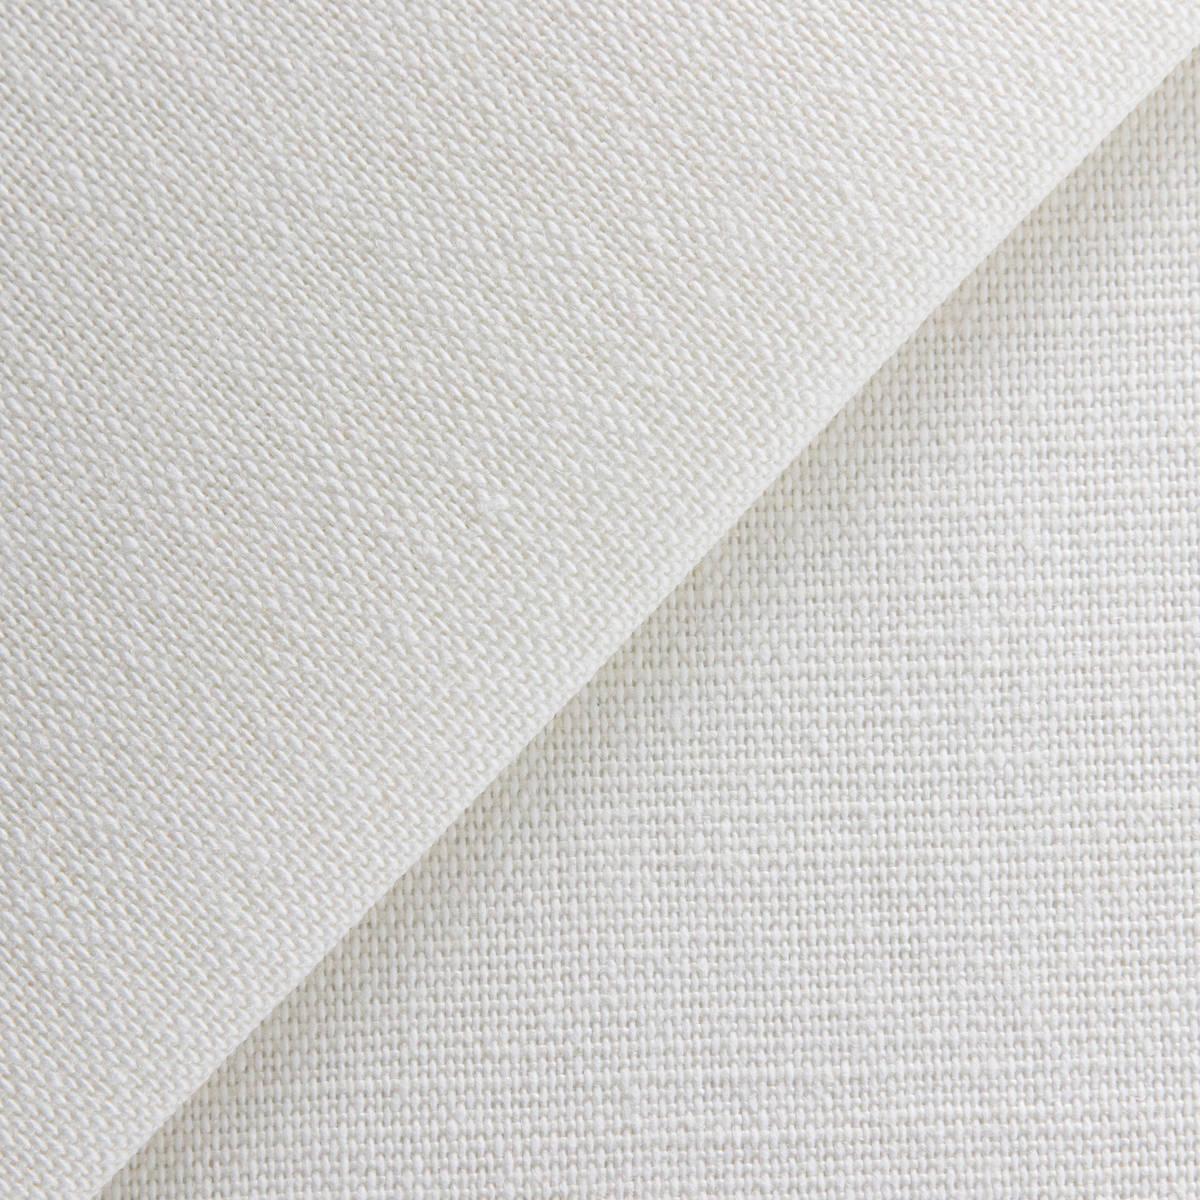 Heavy British Linen 350gsm